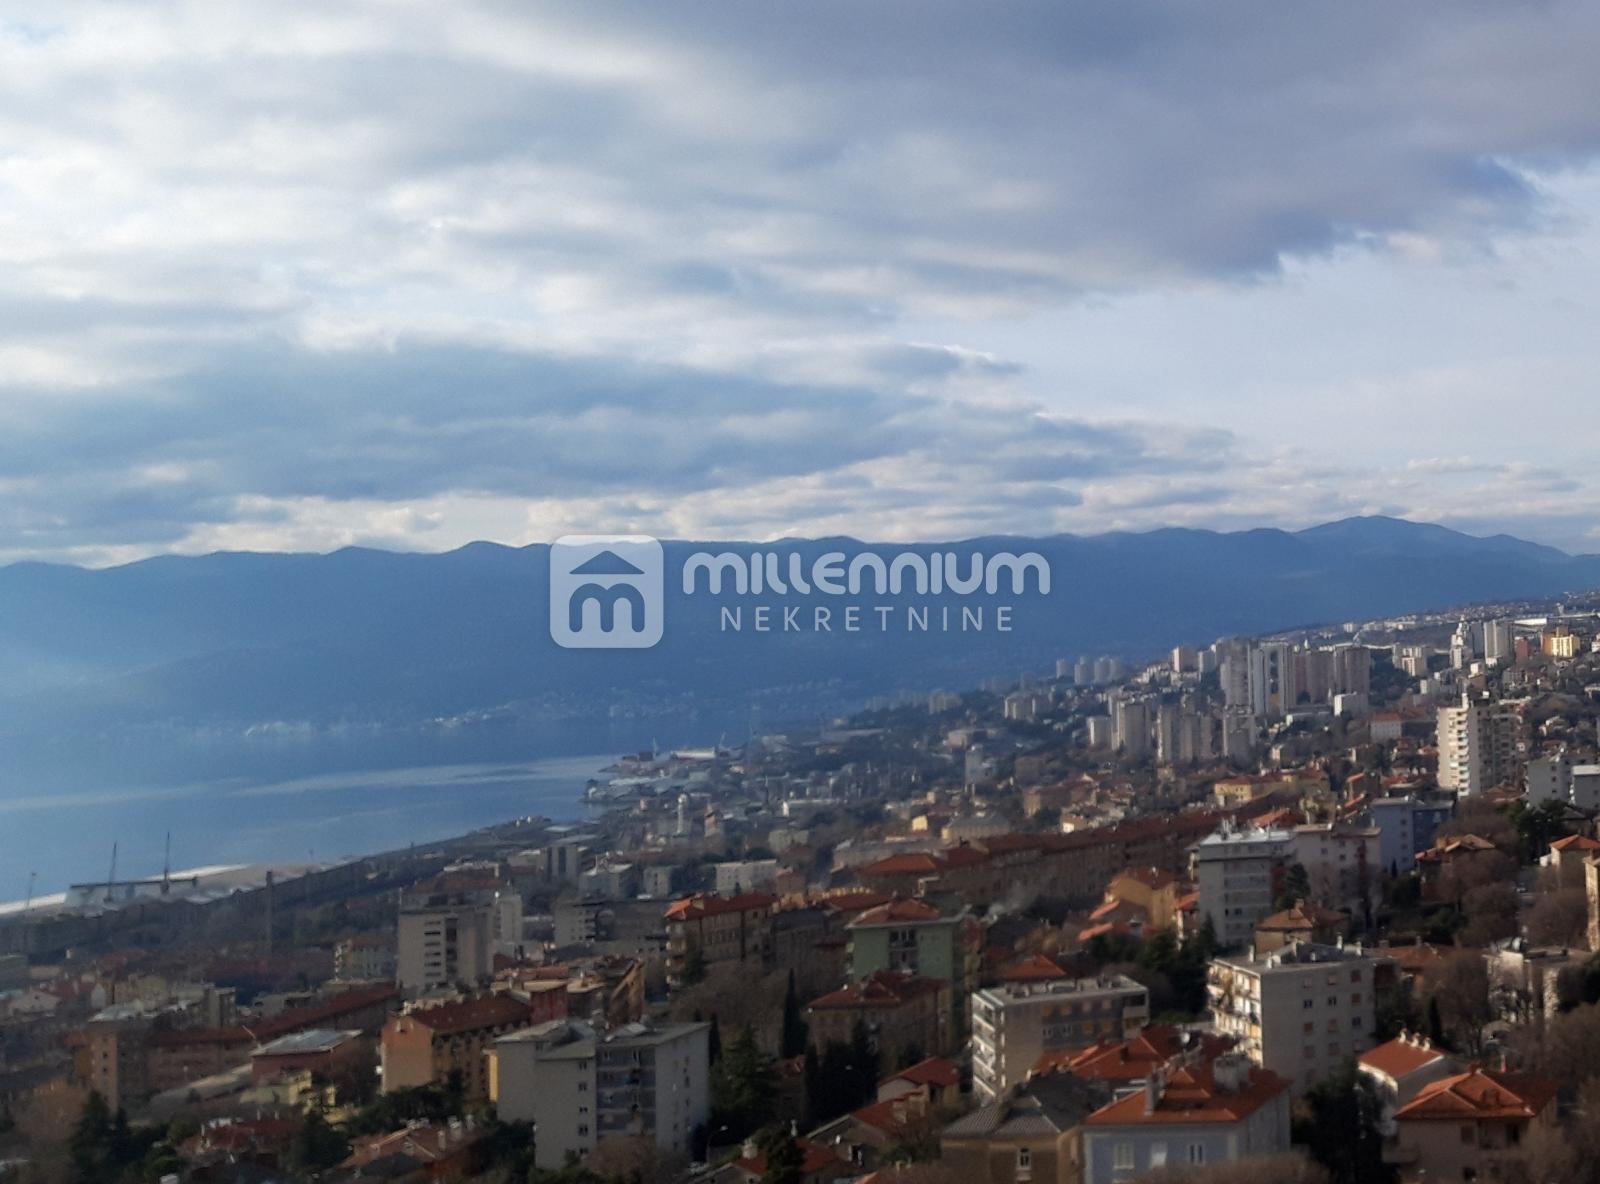 Rijeka, Kozala, 1-sobni stan, balkon, terasa, panoramski pogled